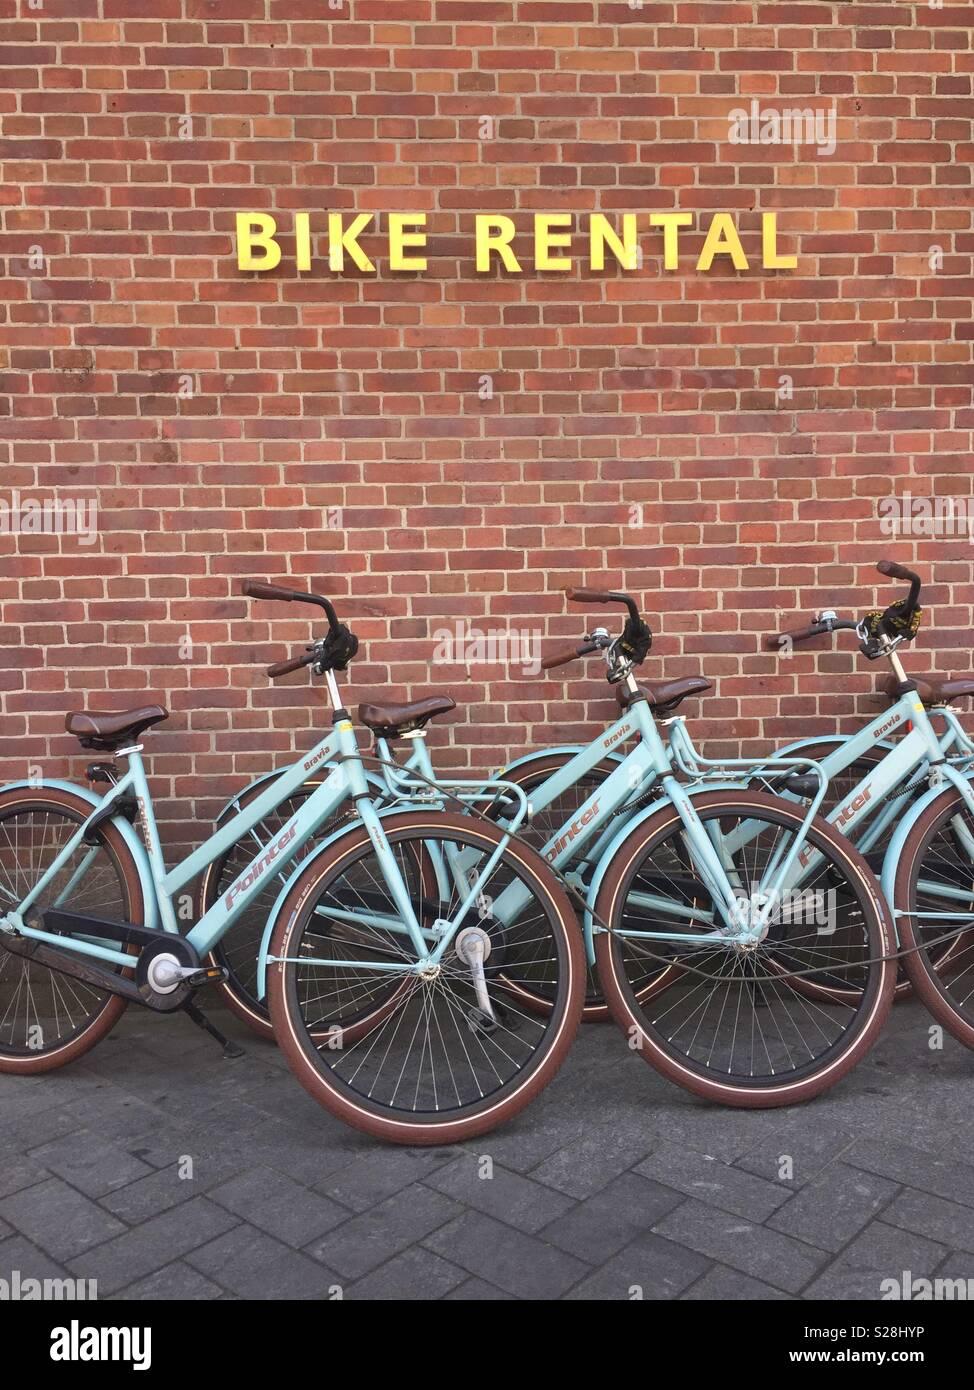 Amsterdam bike rental - Stock Image